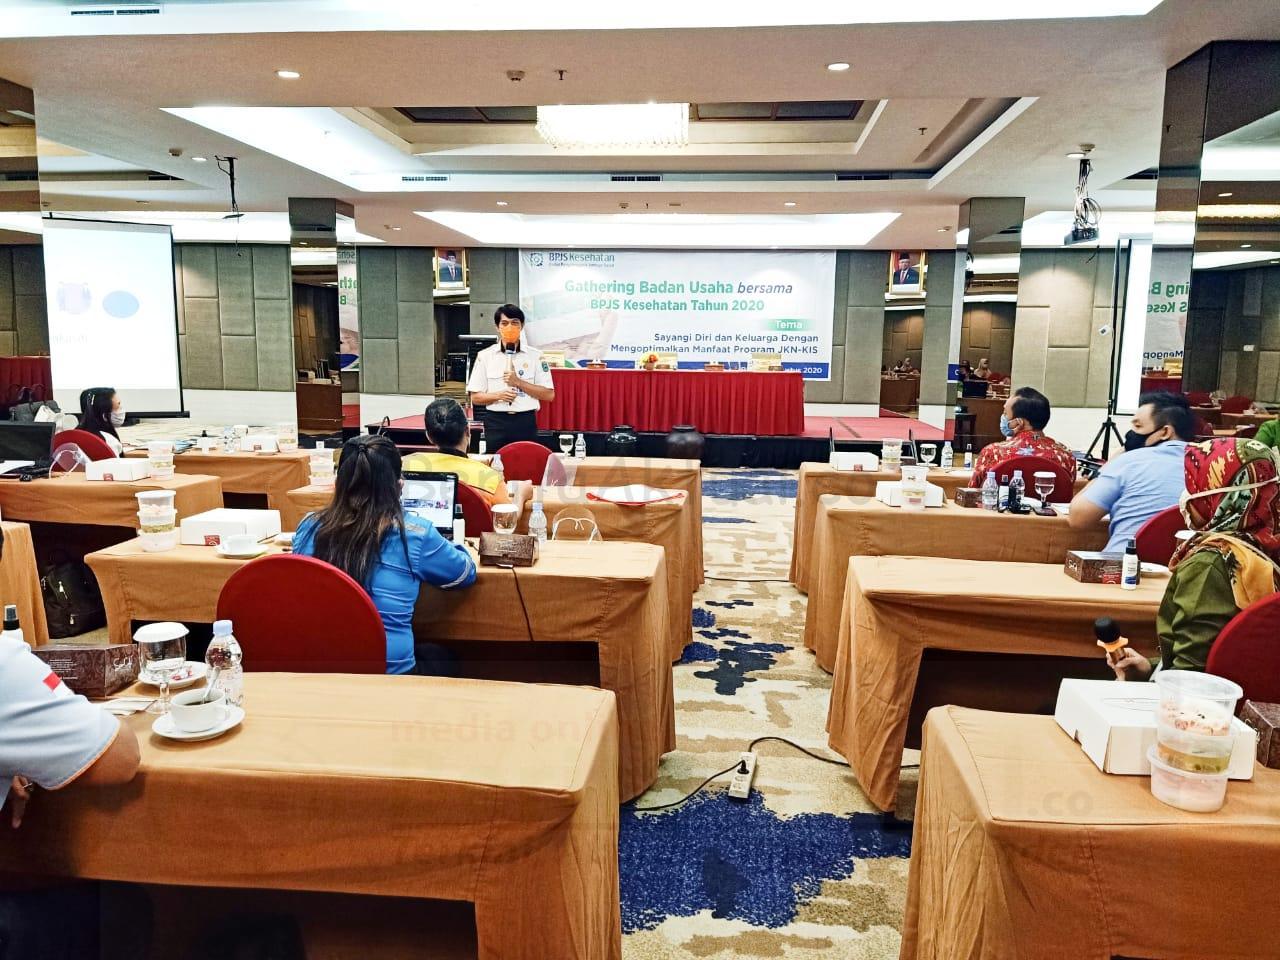 Optimalkan JKN-KIS, 53 Perusahaan di Manokwari Ikut Gathering BPJS Kesehatan 17 IMG 20200819 WA0031